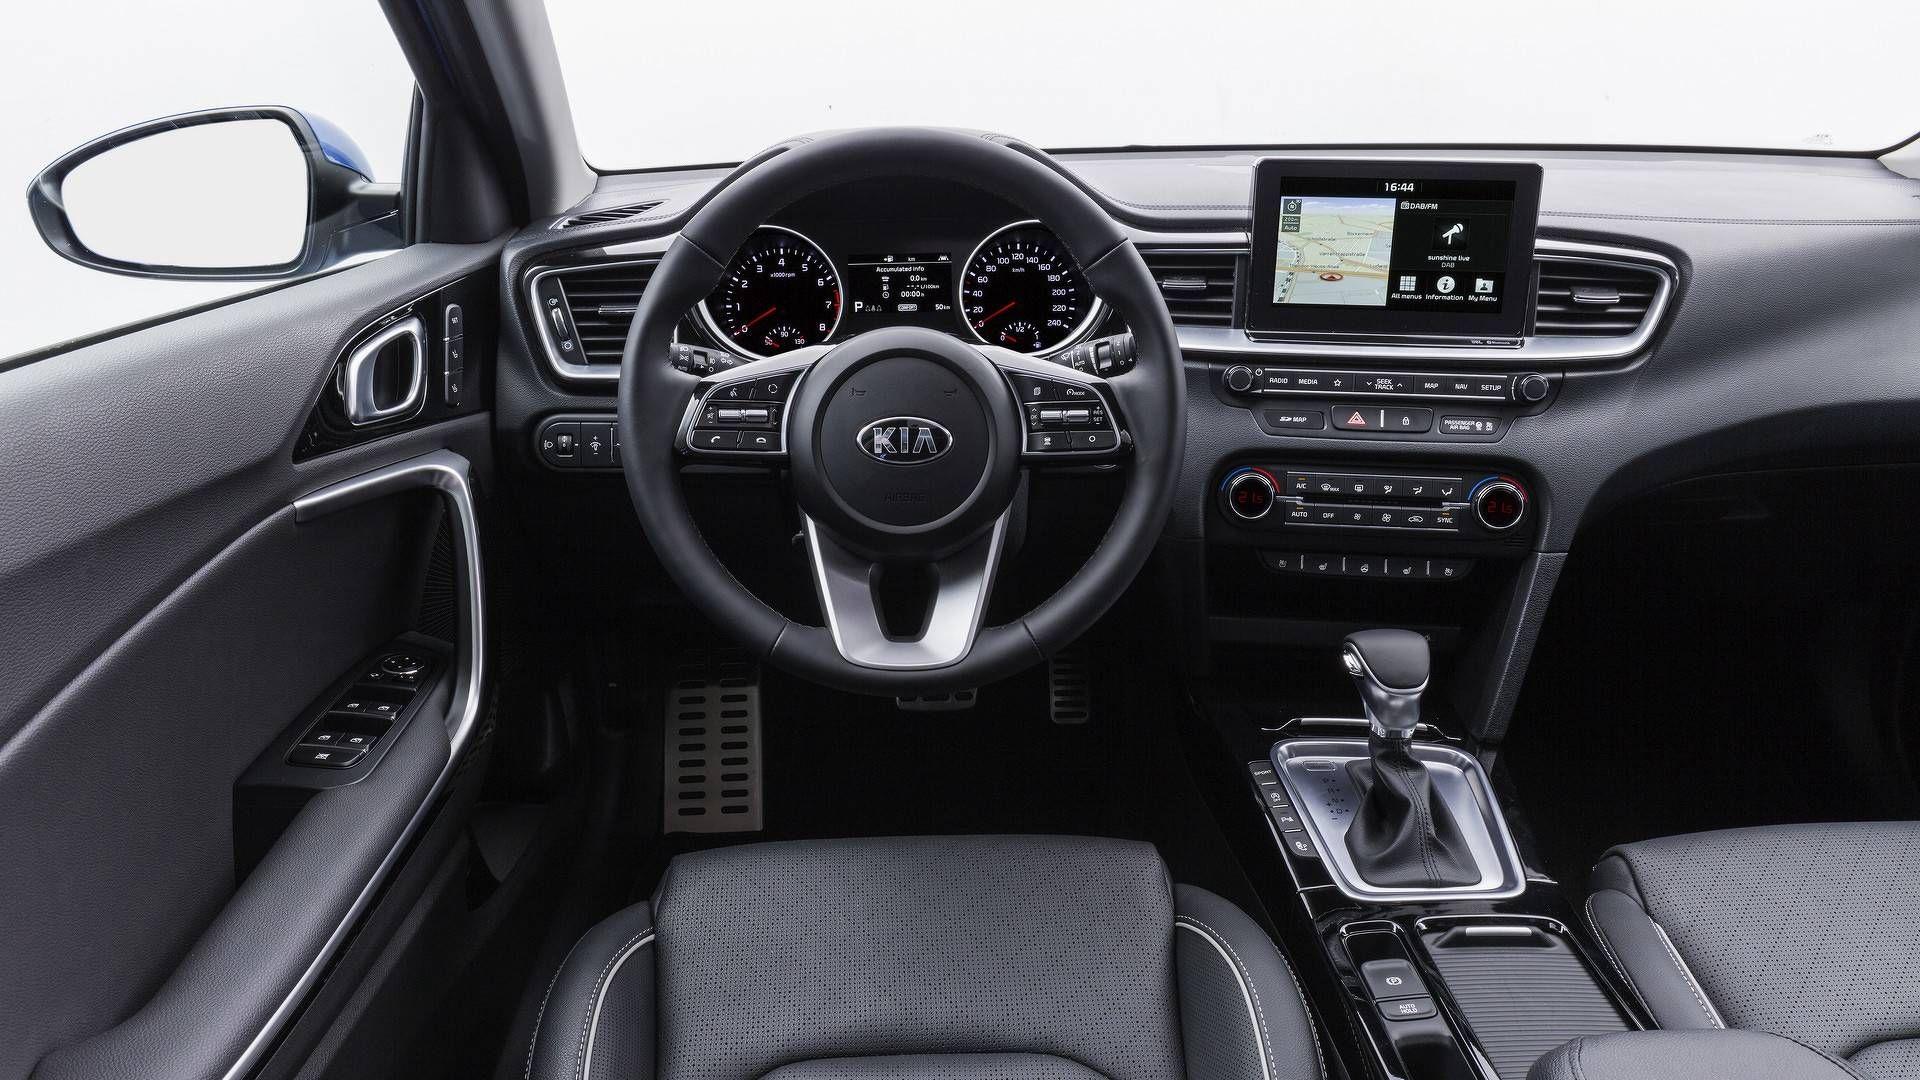 Kia Ceed 2018 Interior Kia Ceed Kia Steering Wheel